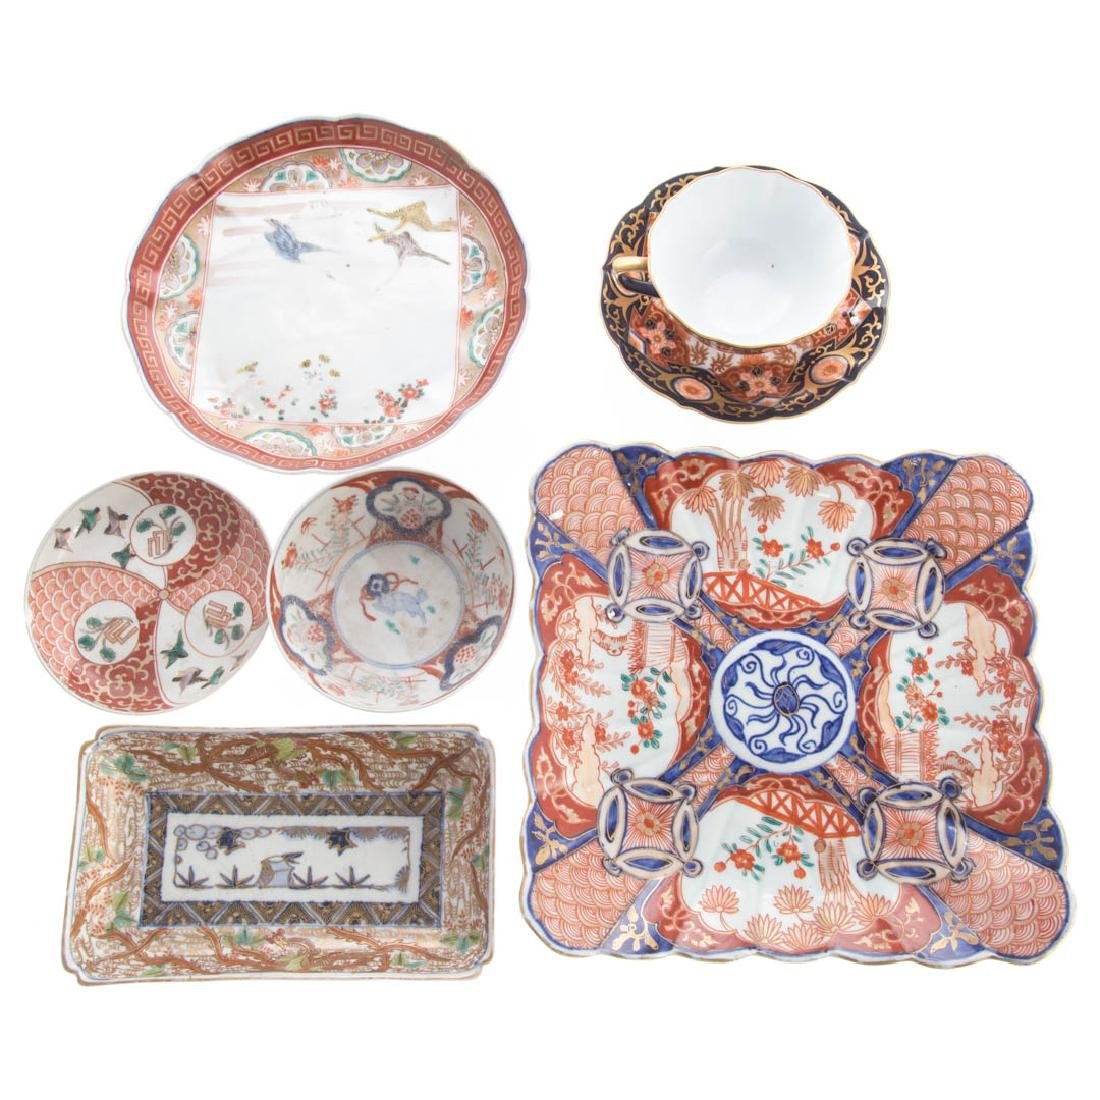 27 pieces of Japanese Imari porcelain